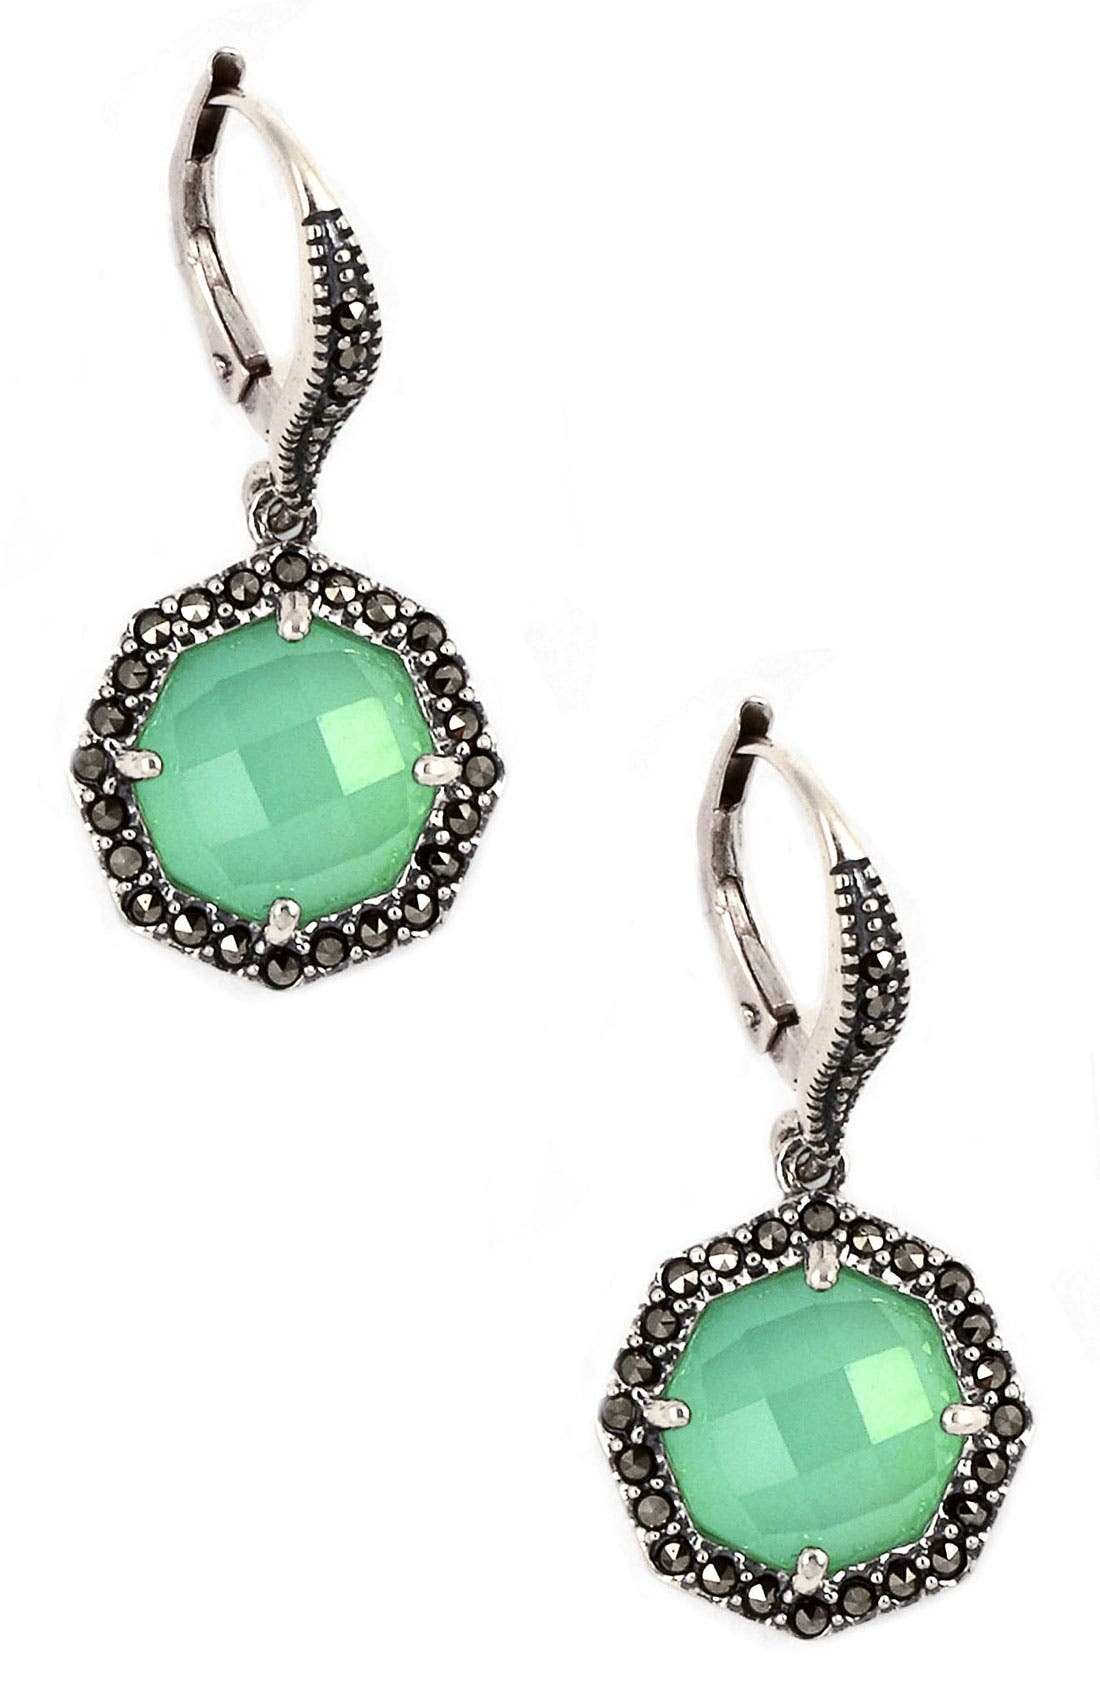 Main Image - Judith Jack 'Maldives' Small Stone Drop Earrings